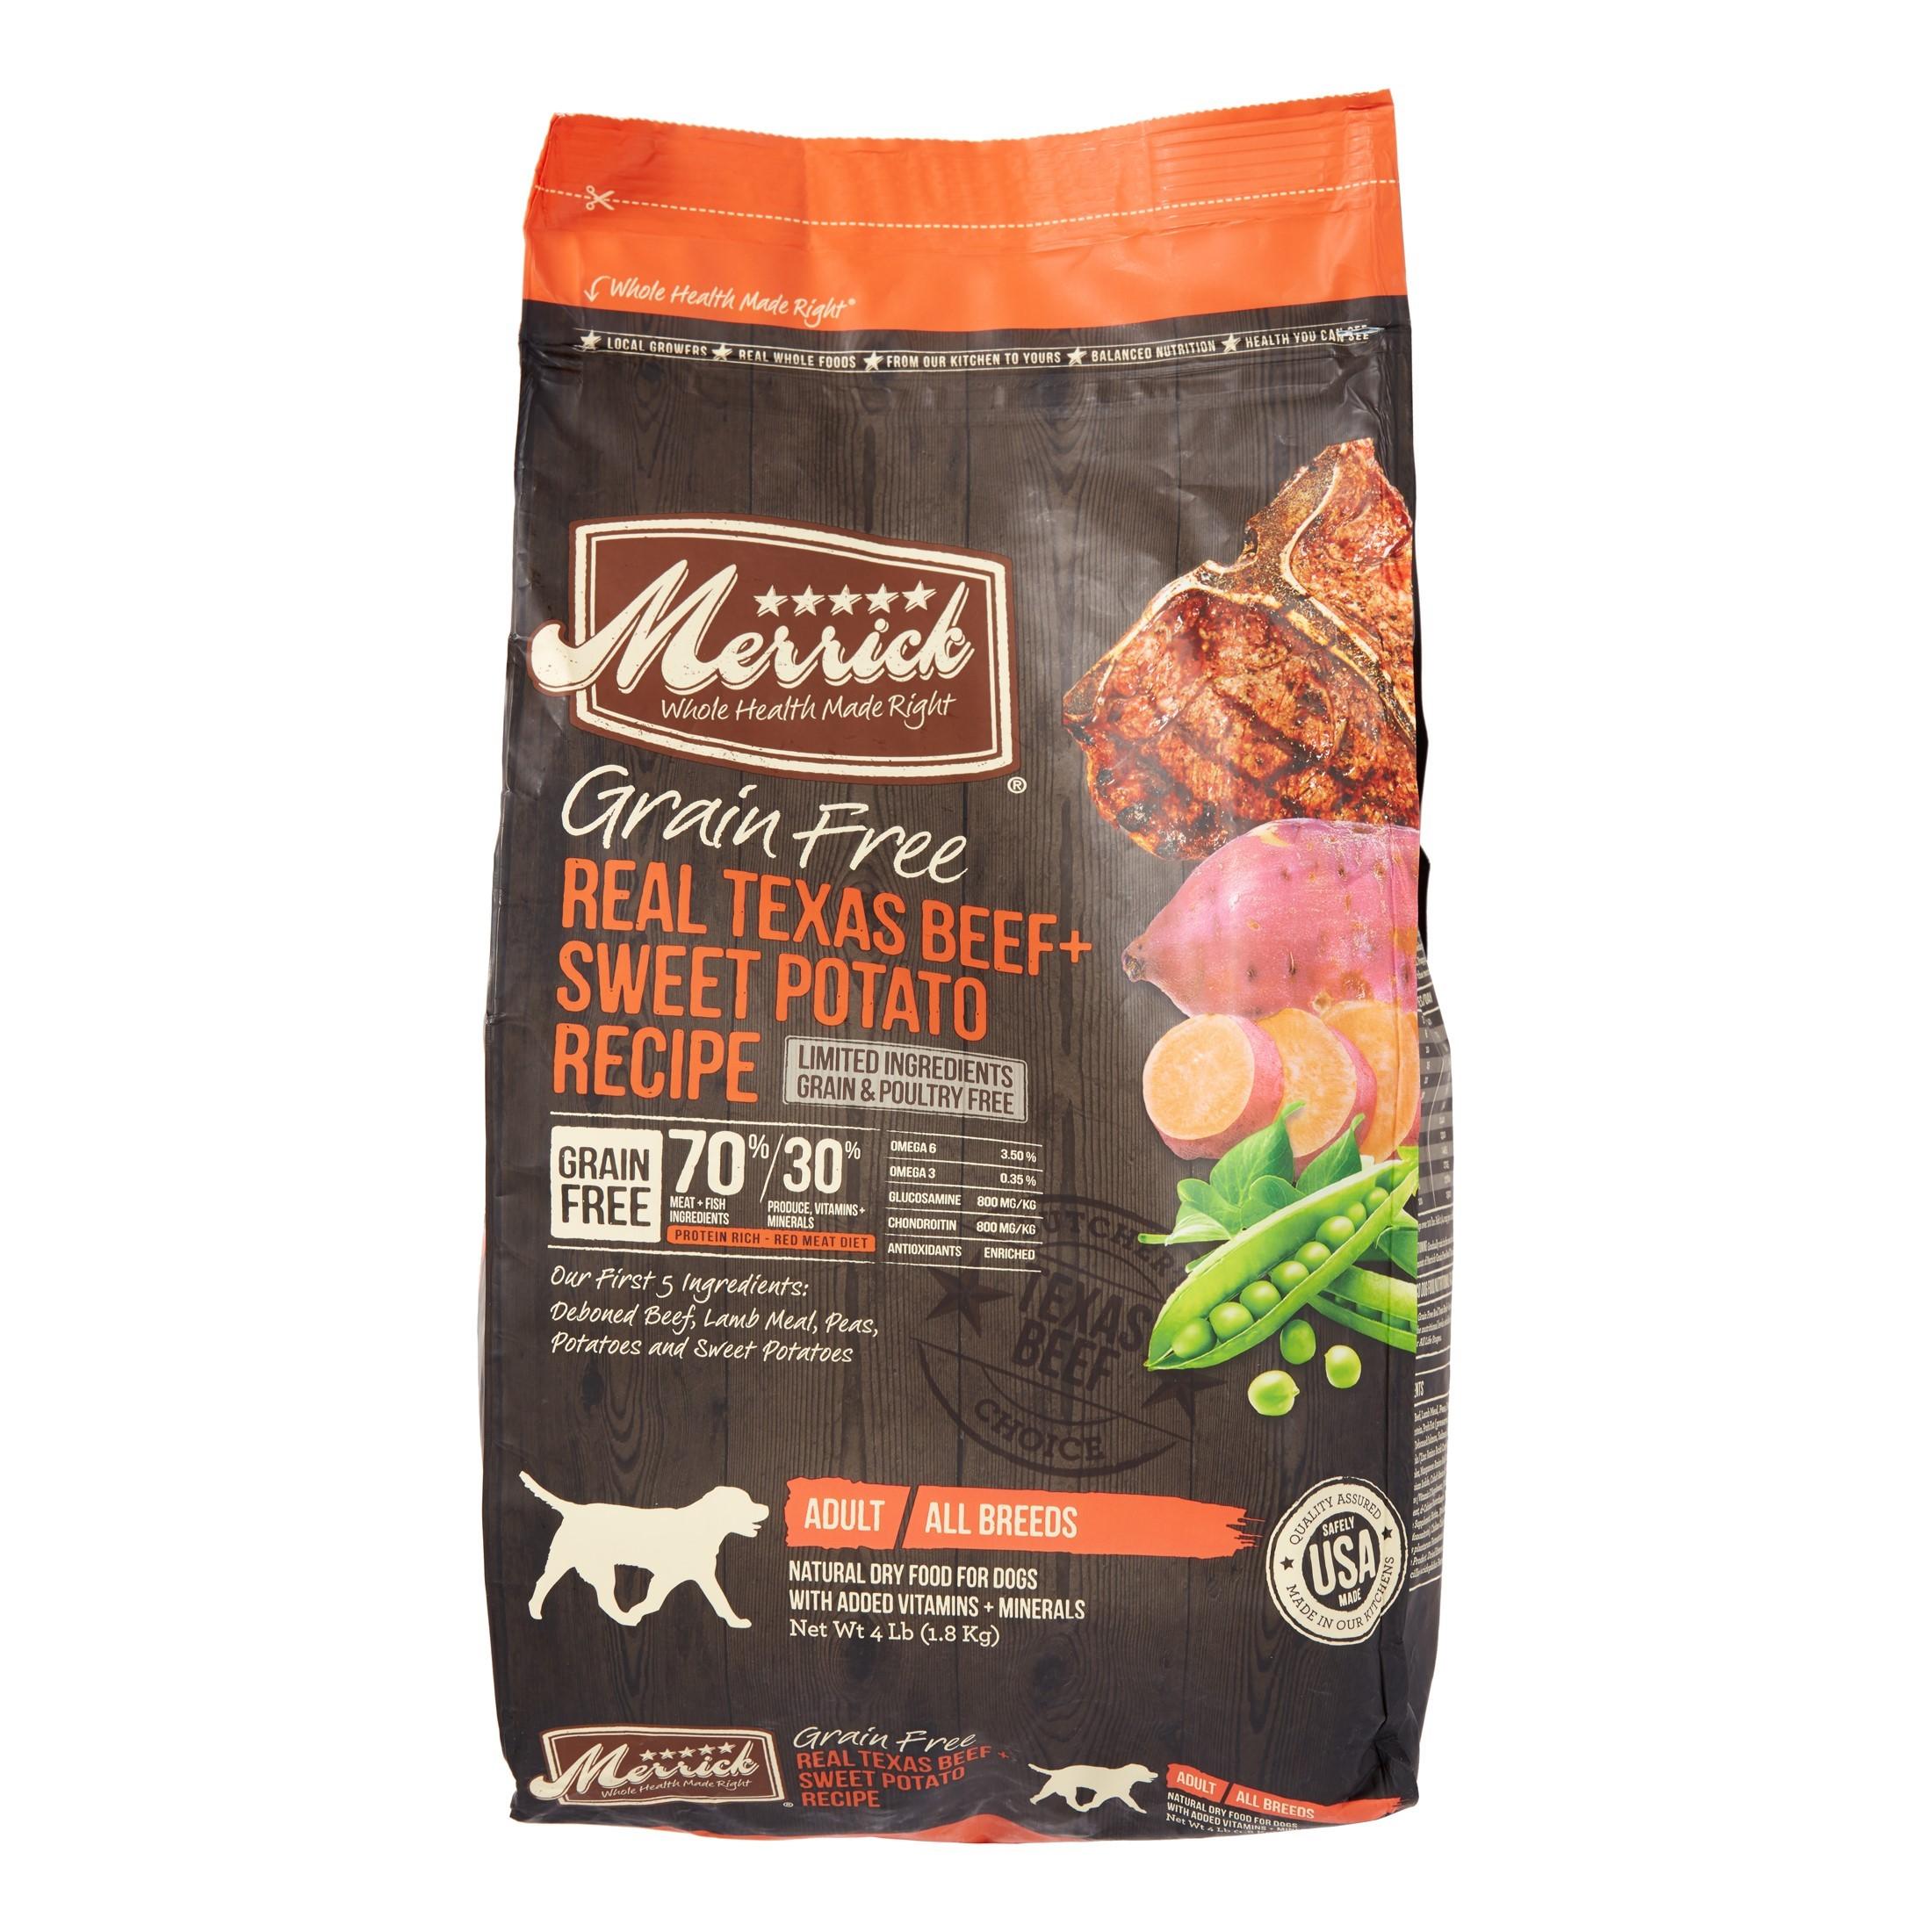 Merrick Grain-Free Real Texas Beef + Sweet Potato Recipe Dry Dog Food, 4 lb